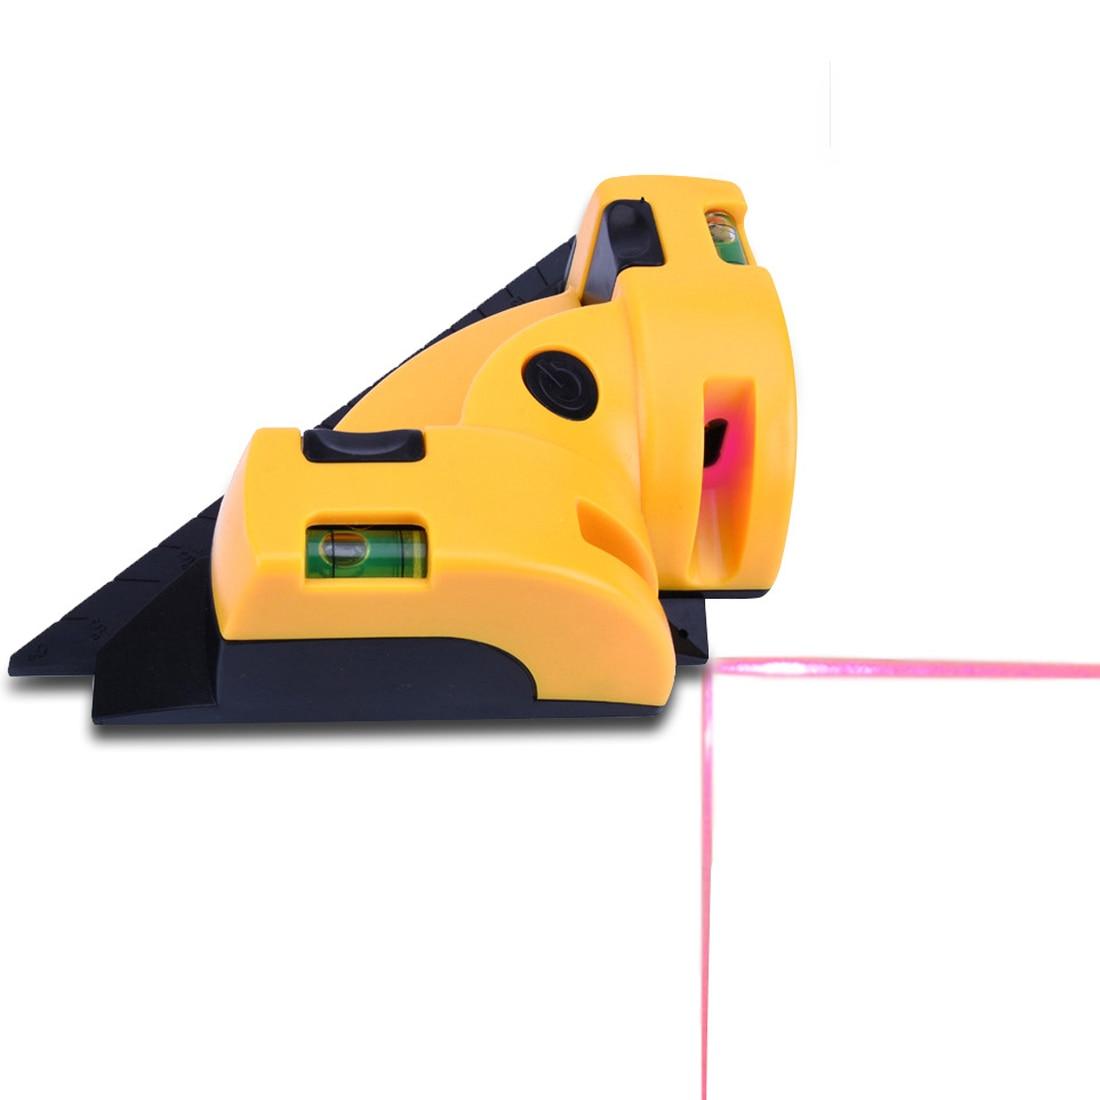 Rechten Winkel 90 Grad Vertikale Horizontale Laser Linie Projektion Platz Ebene